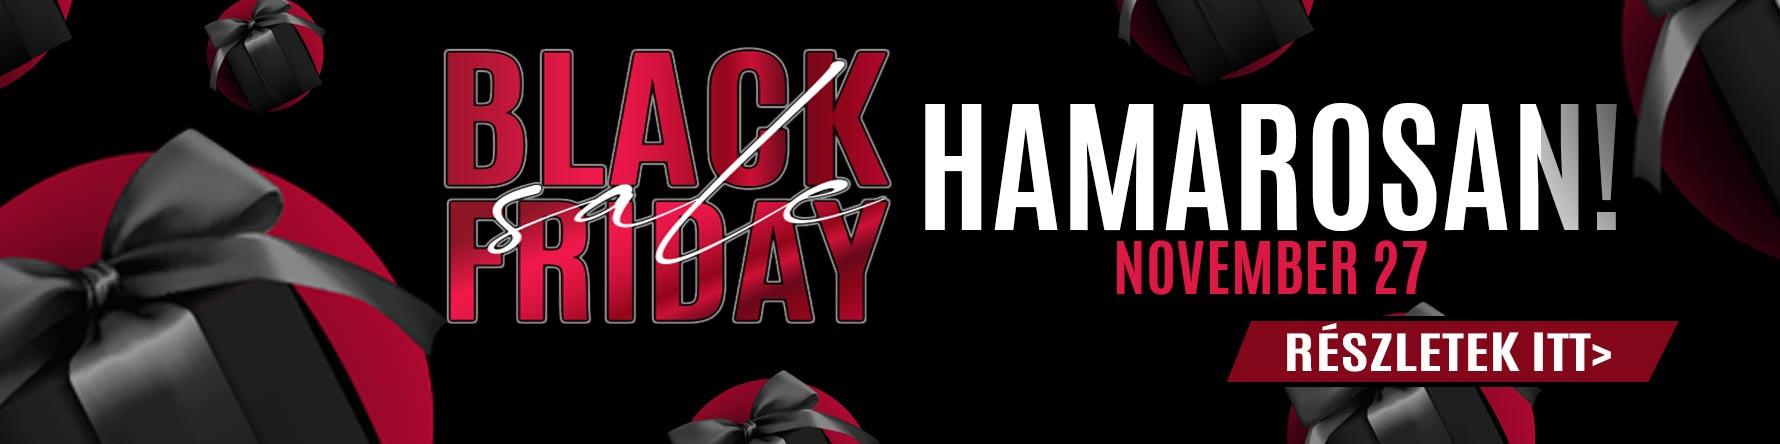 HAMAROSAN BLACKFRIDAY